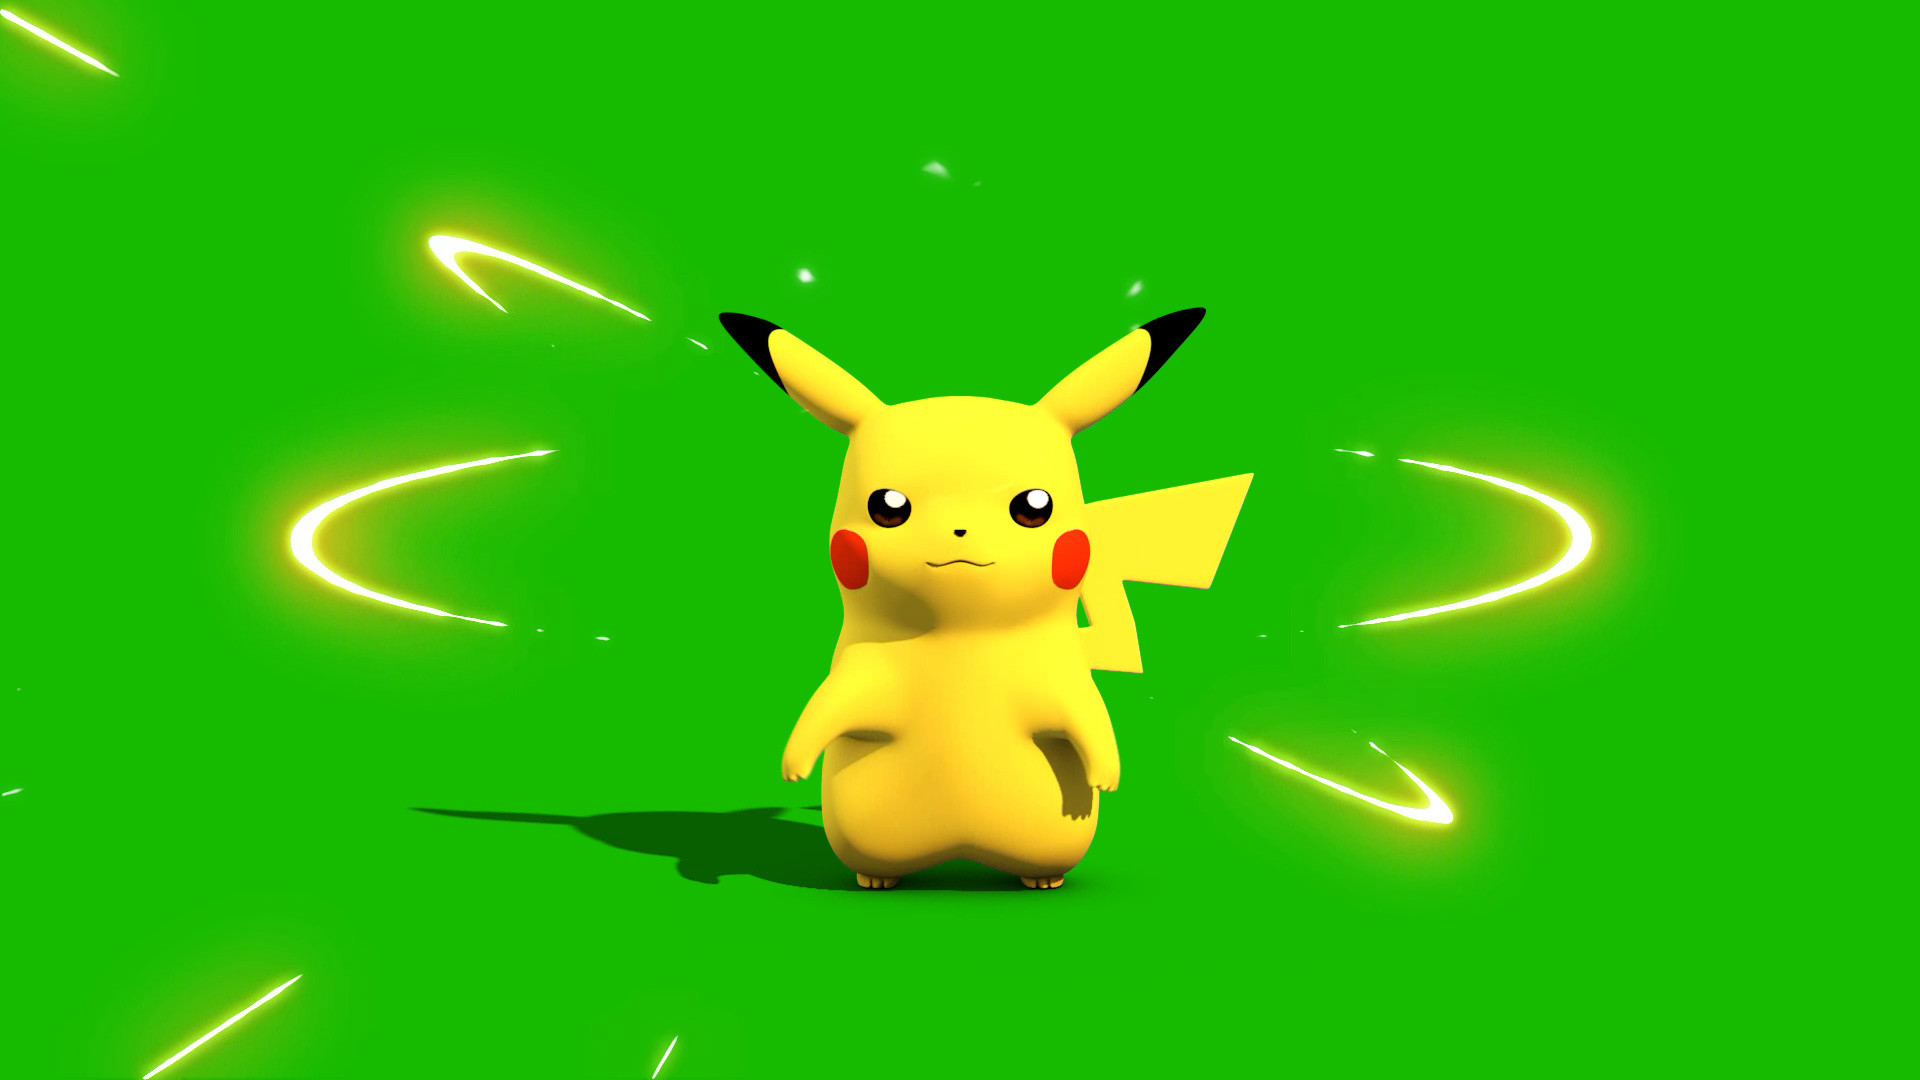 Pikachu wallpapers